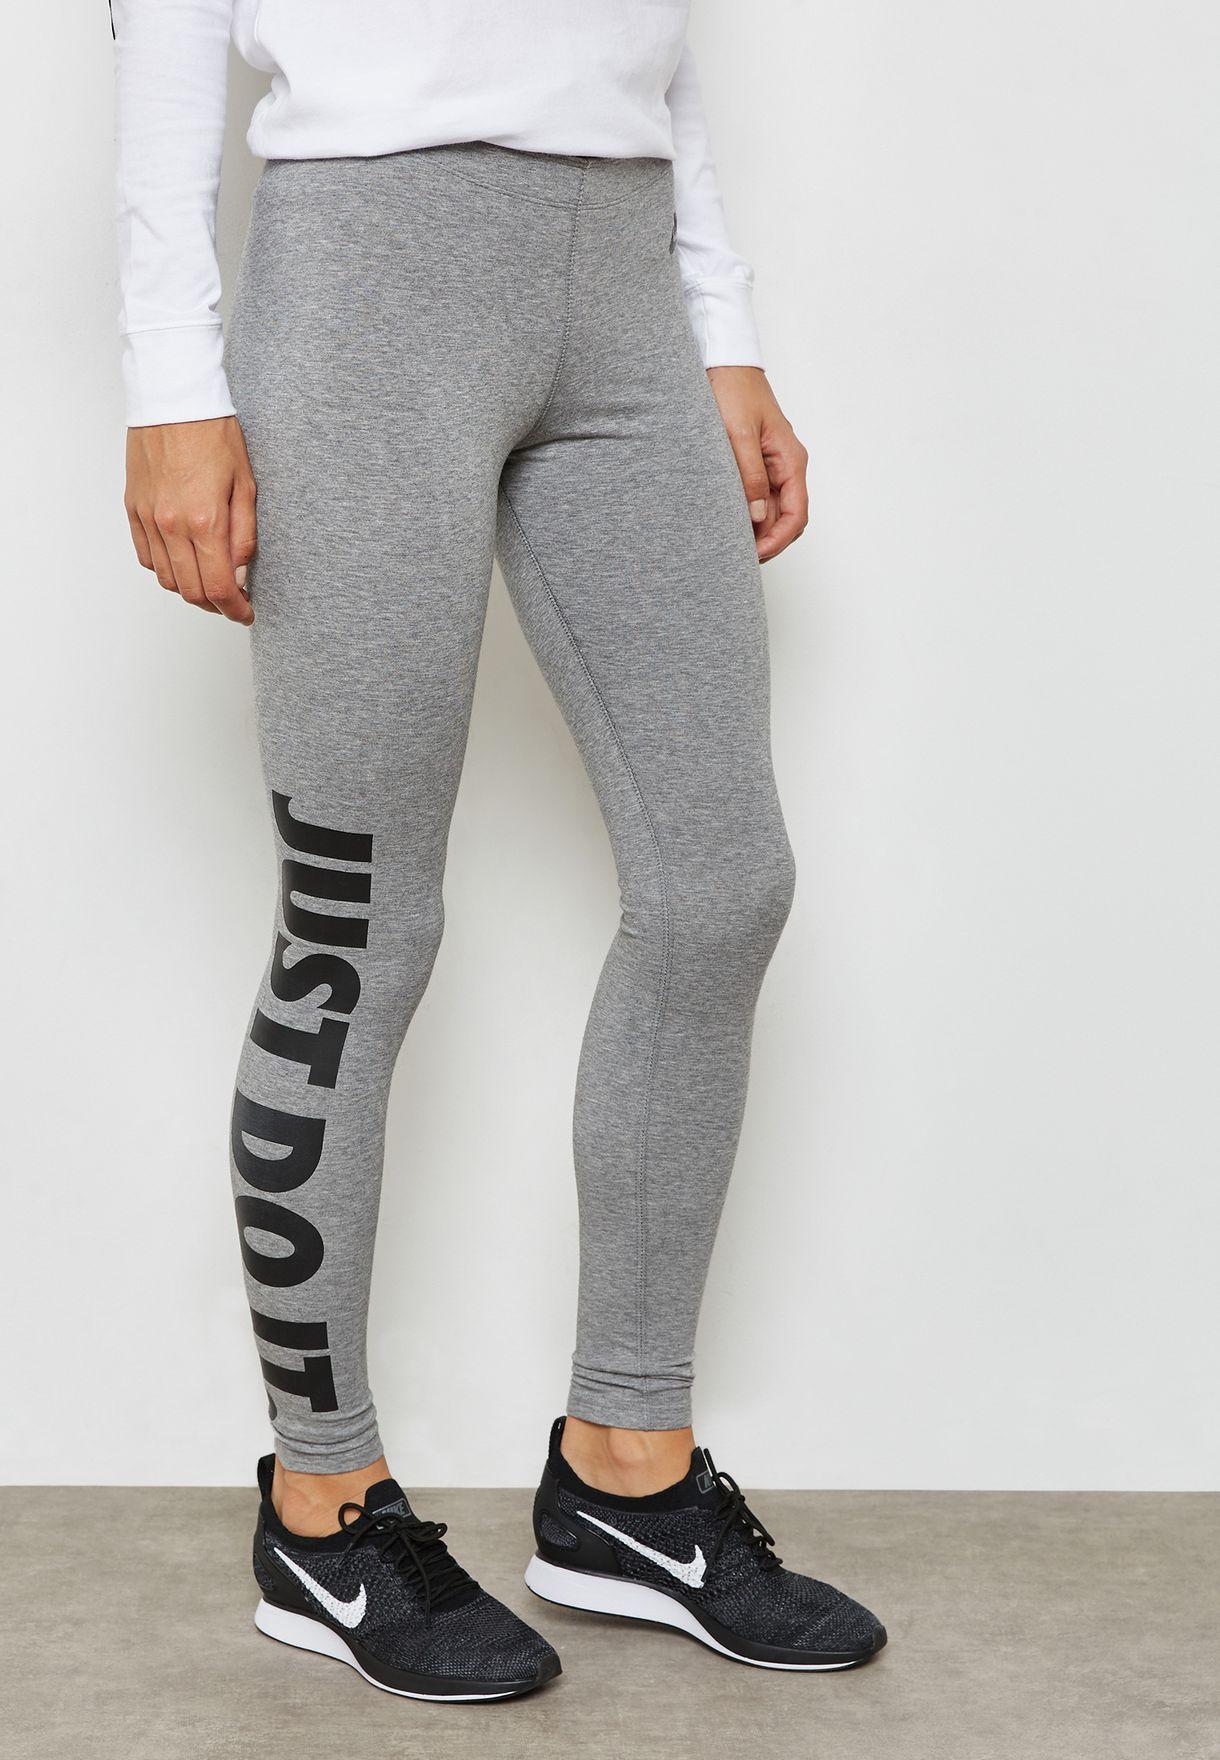 58c681e795170 Shop Nike grey JDI Leg-A-See Leggings AH2008-091 for Women in UAE ...